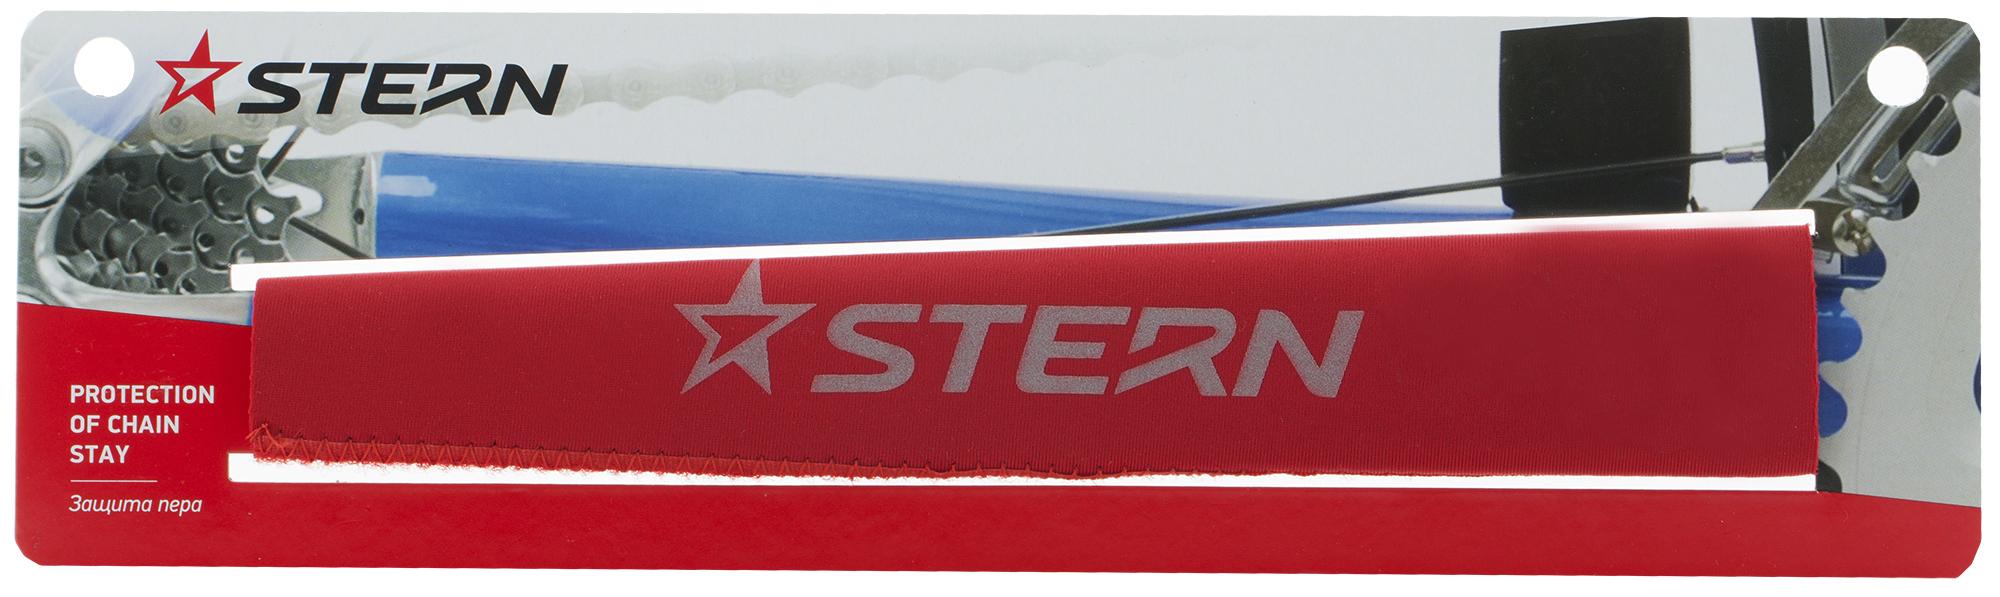 Stern Неопреновая защита перьев